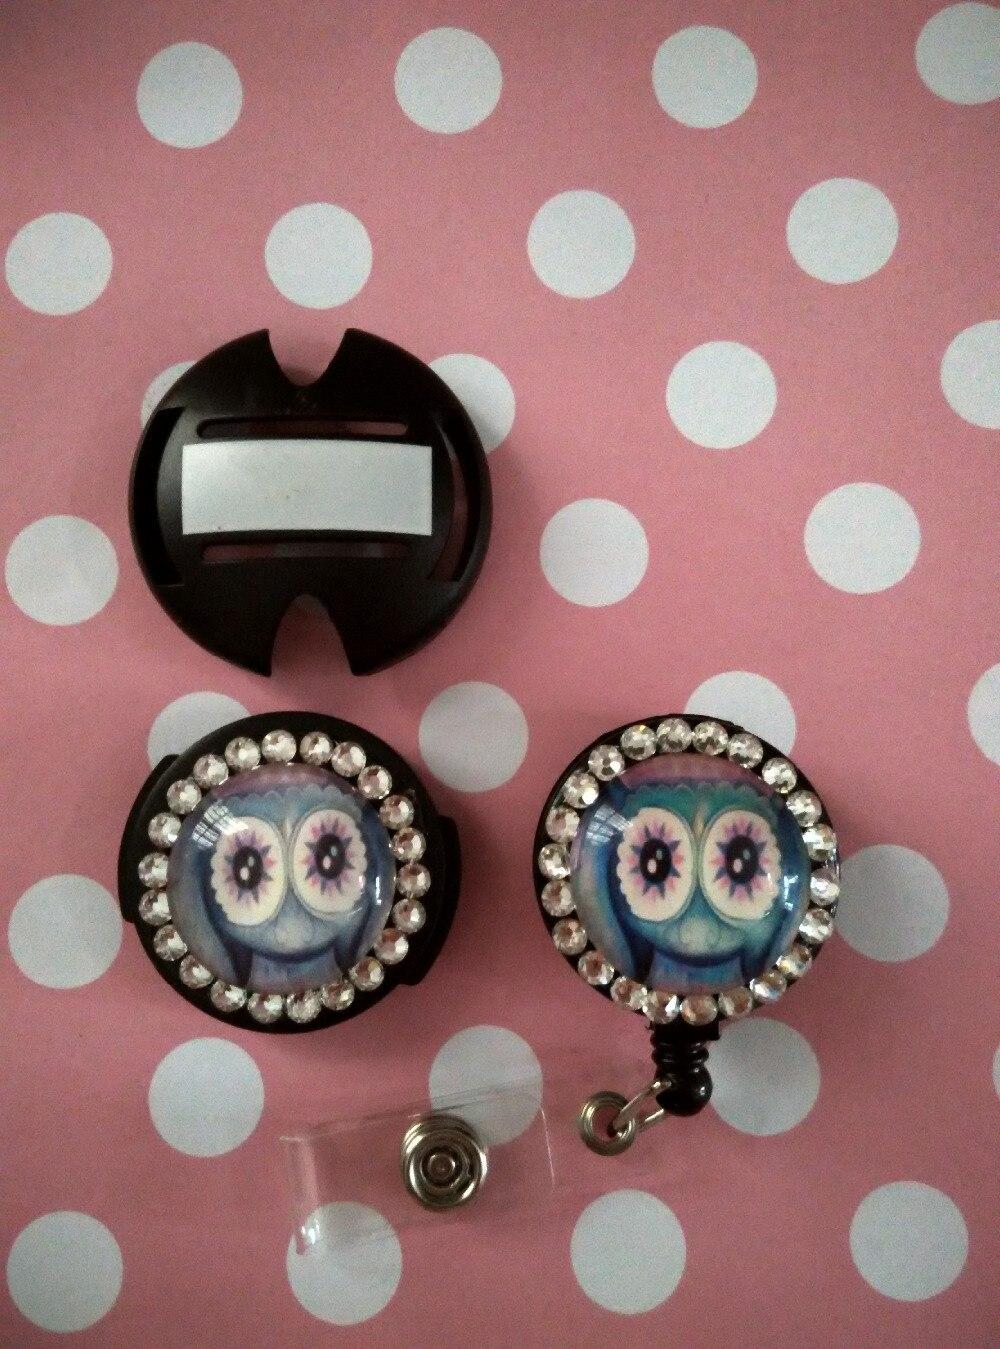 все цены на Owl Retractable id badge reel & stethoscope tag 2pcs/ set